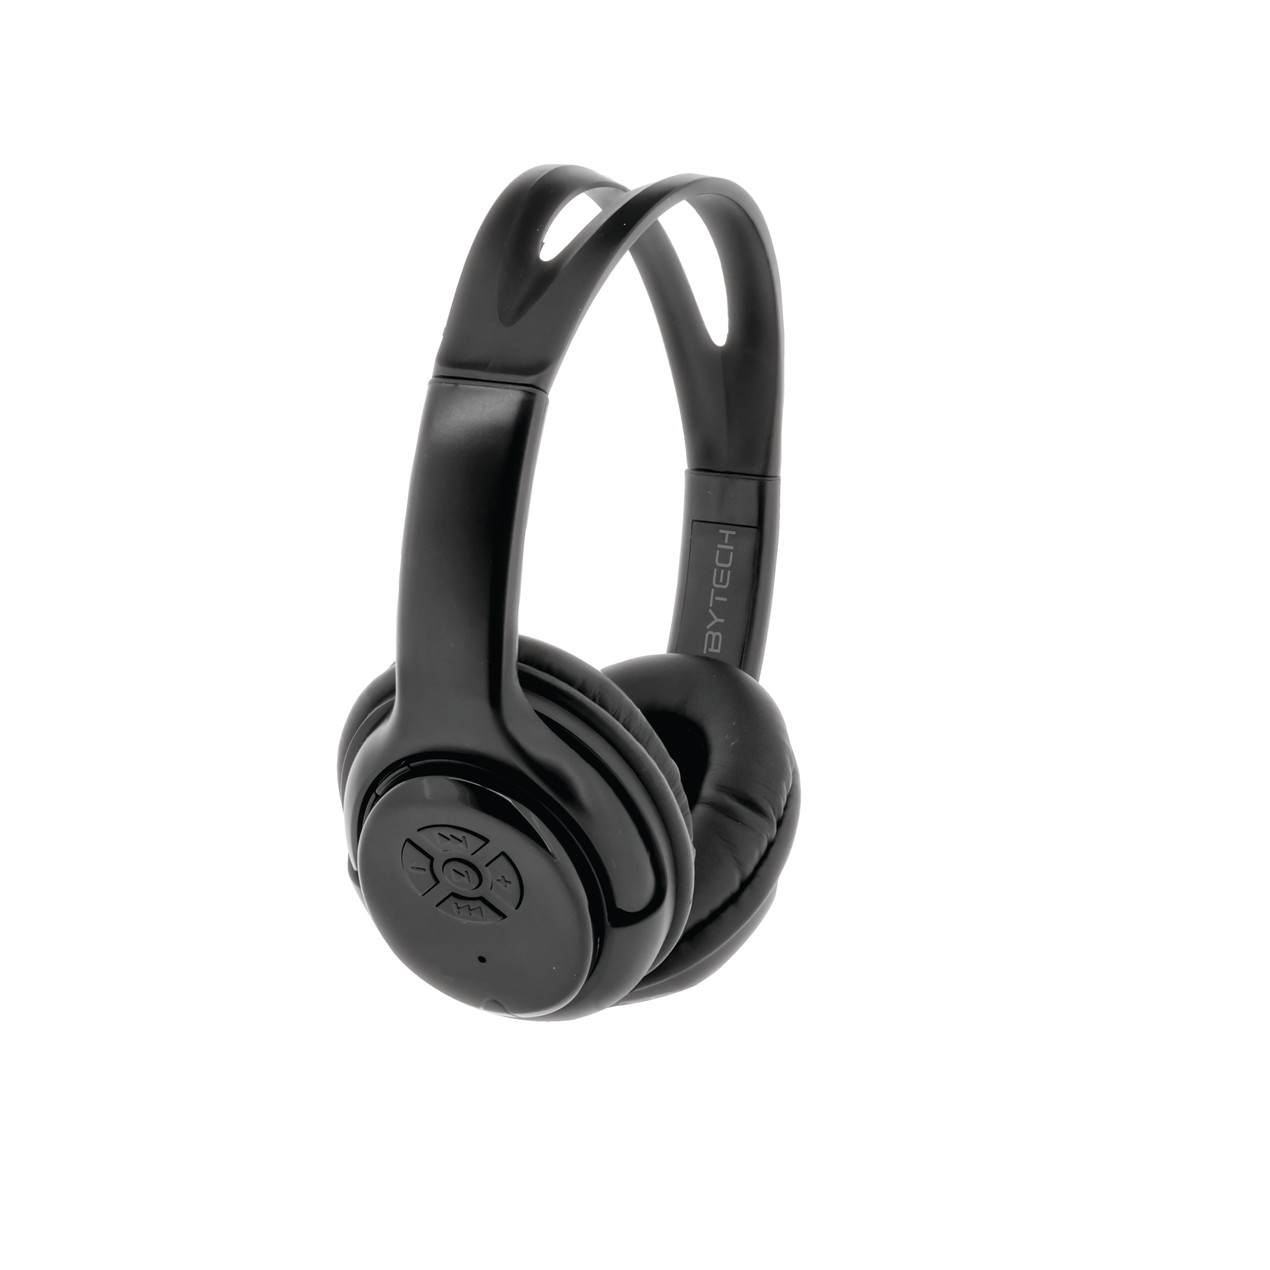 40975222f07 Bytech Wireless Bluetooth Headphones - Black Bytech Wireless Bluetooth  Headphones - Black